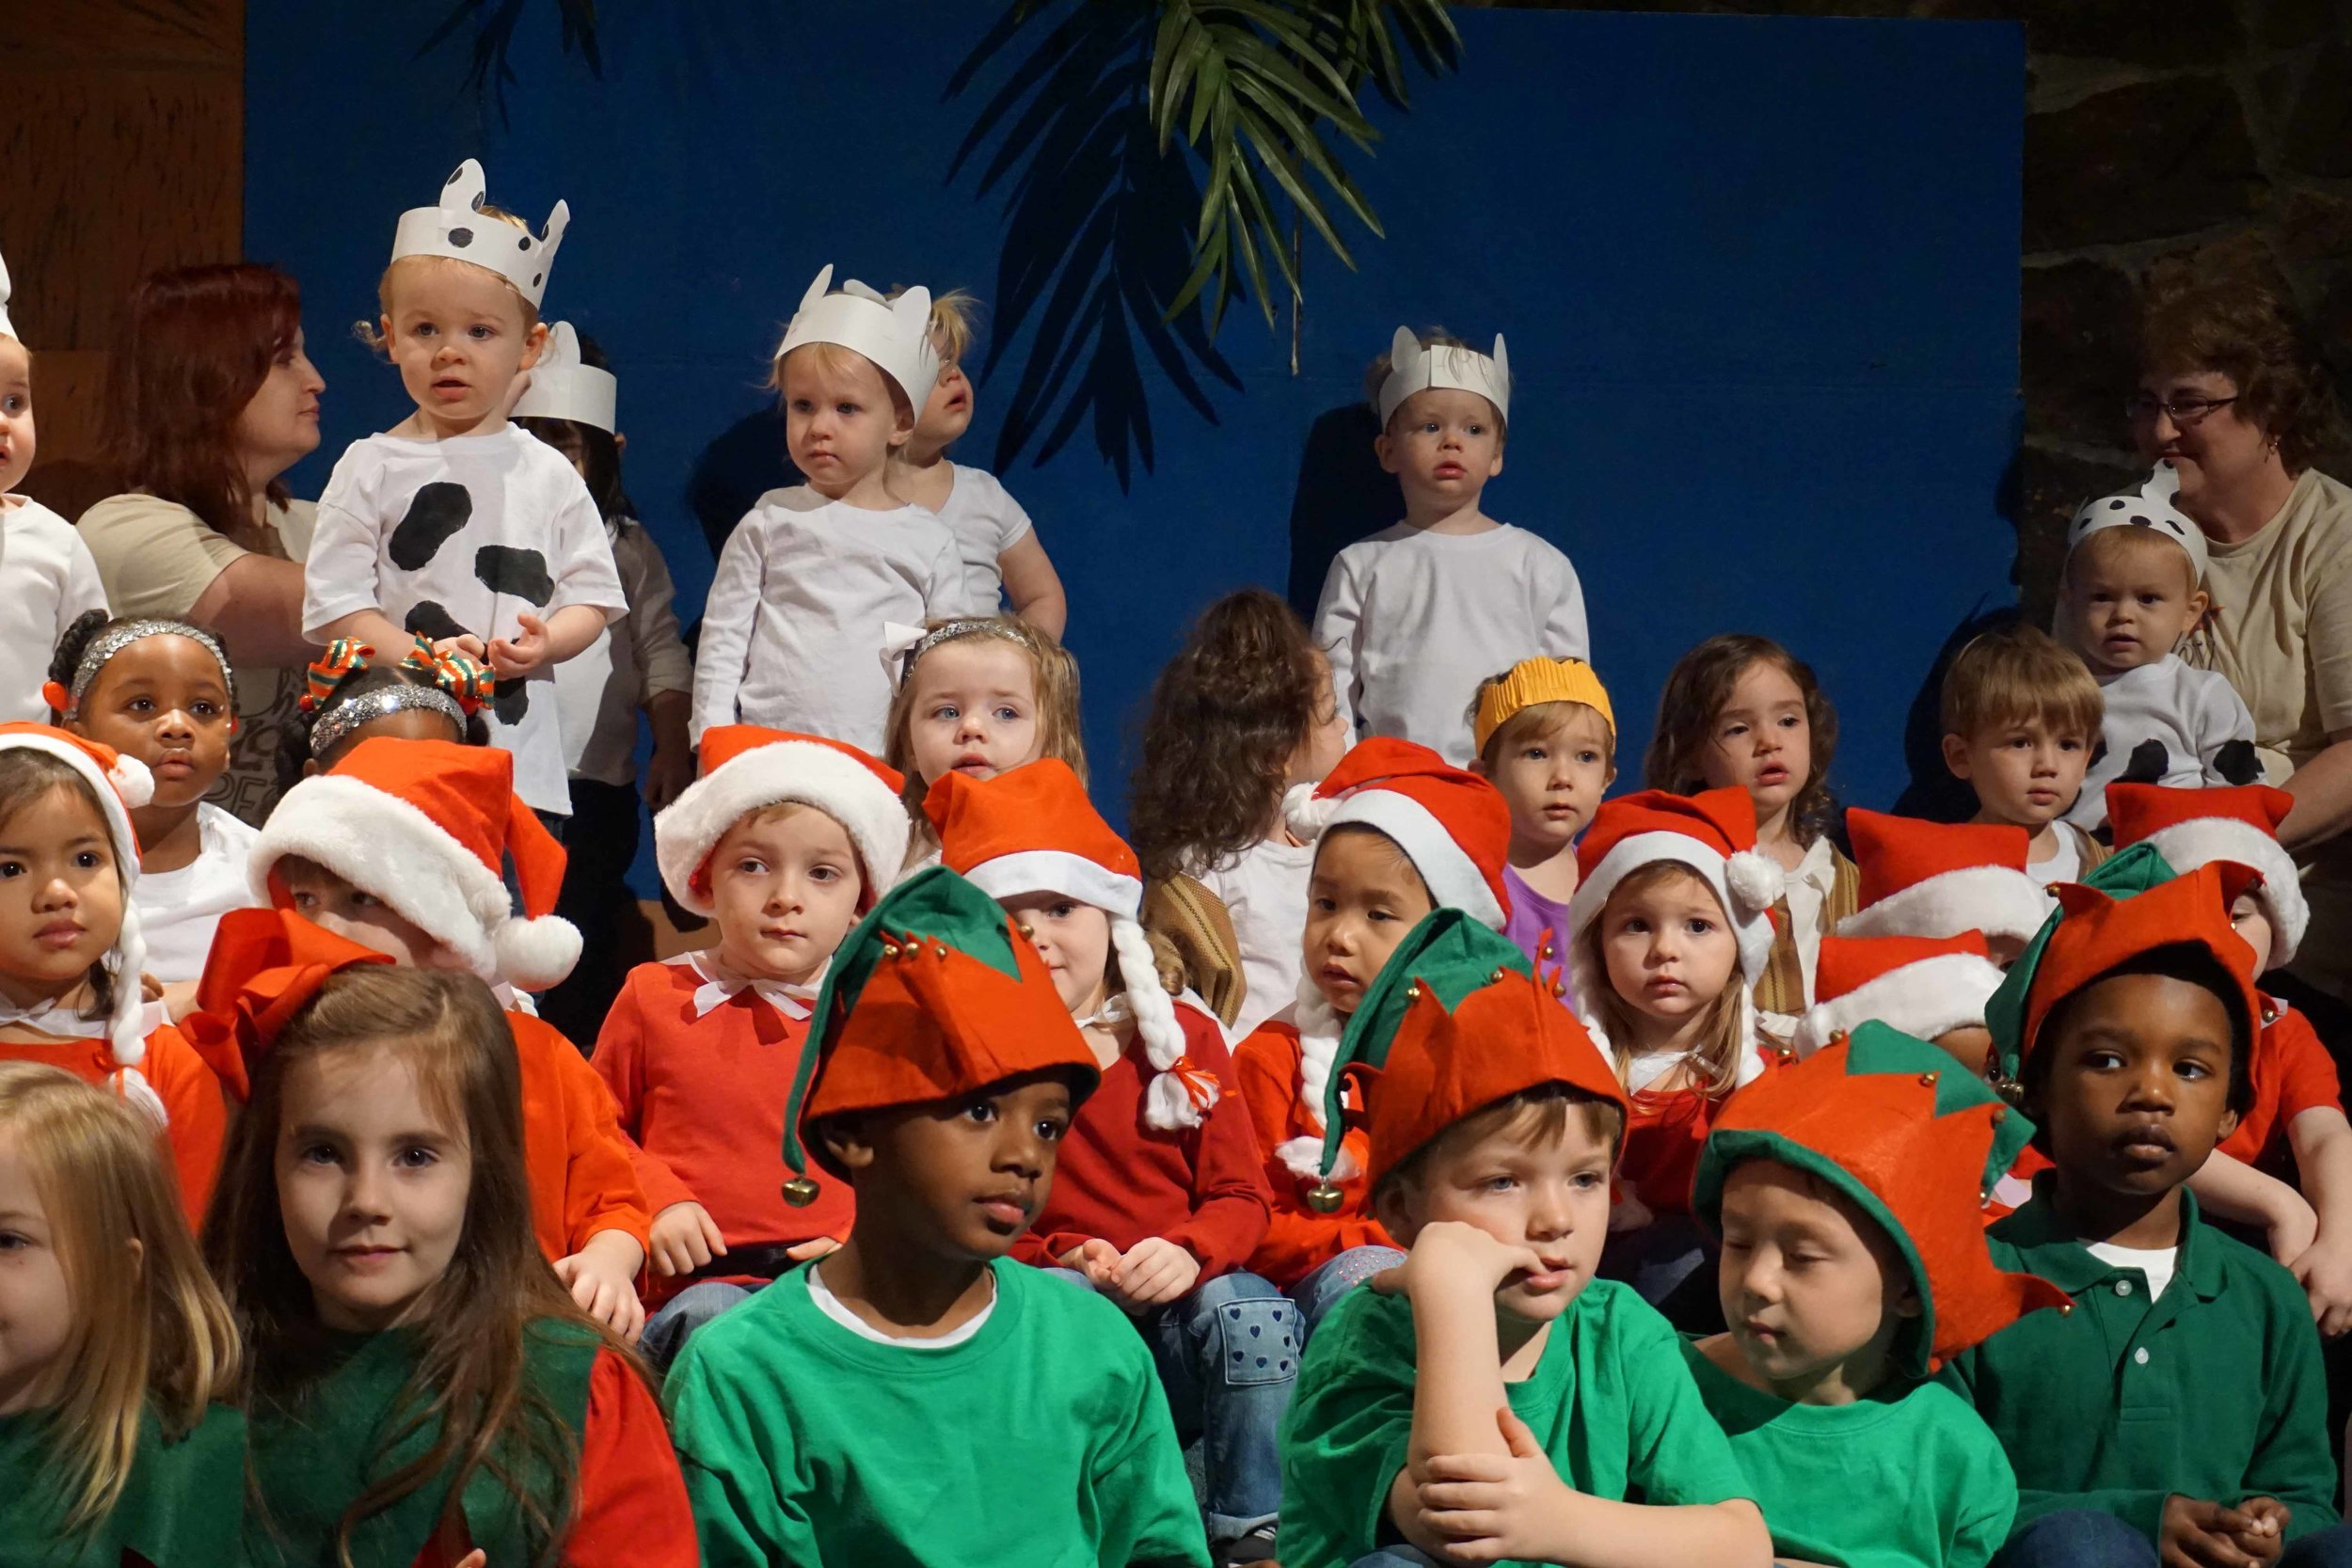 Dec13 WSLH ChristmasProgramTinyTravelers&HappyCamp67.jpg